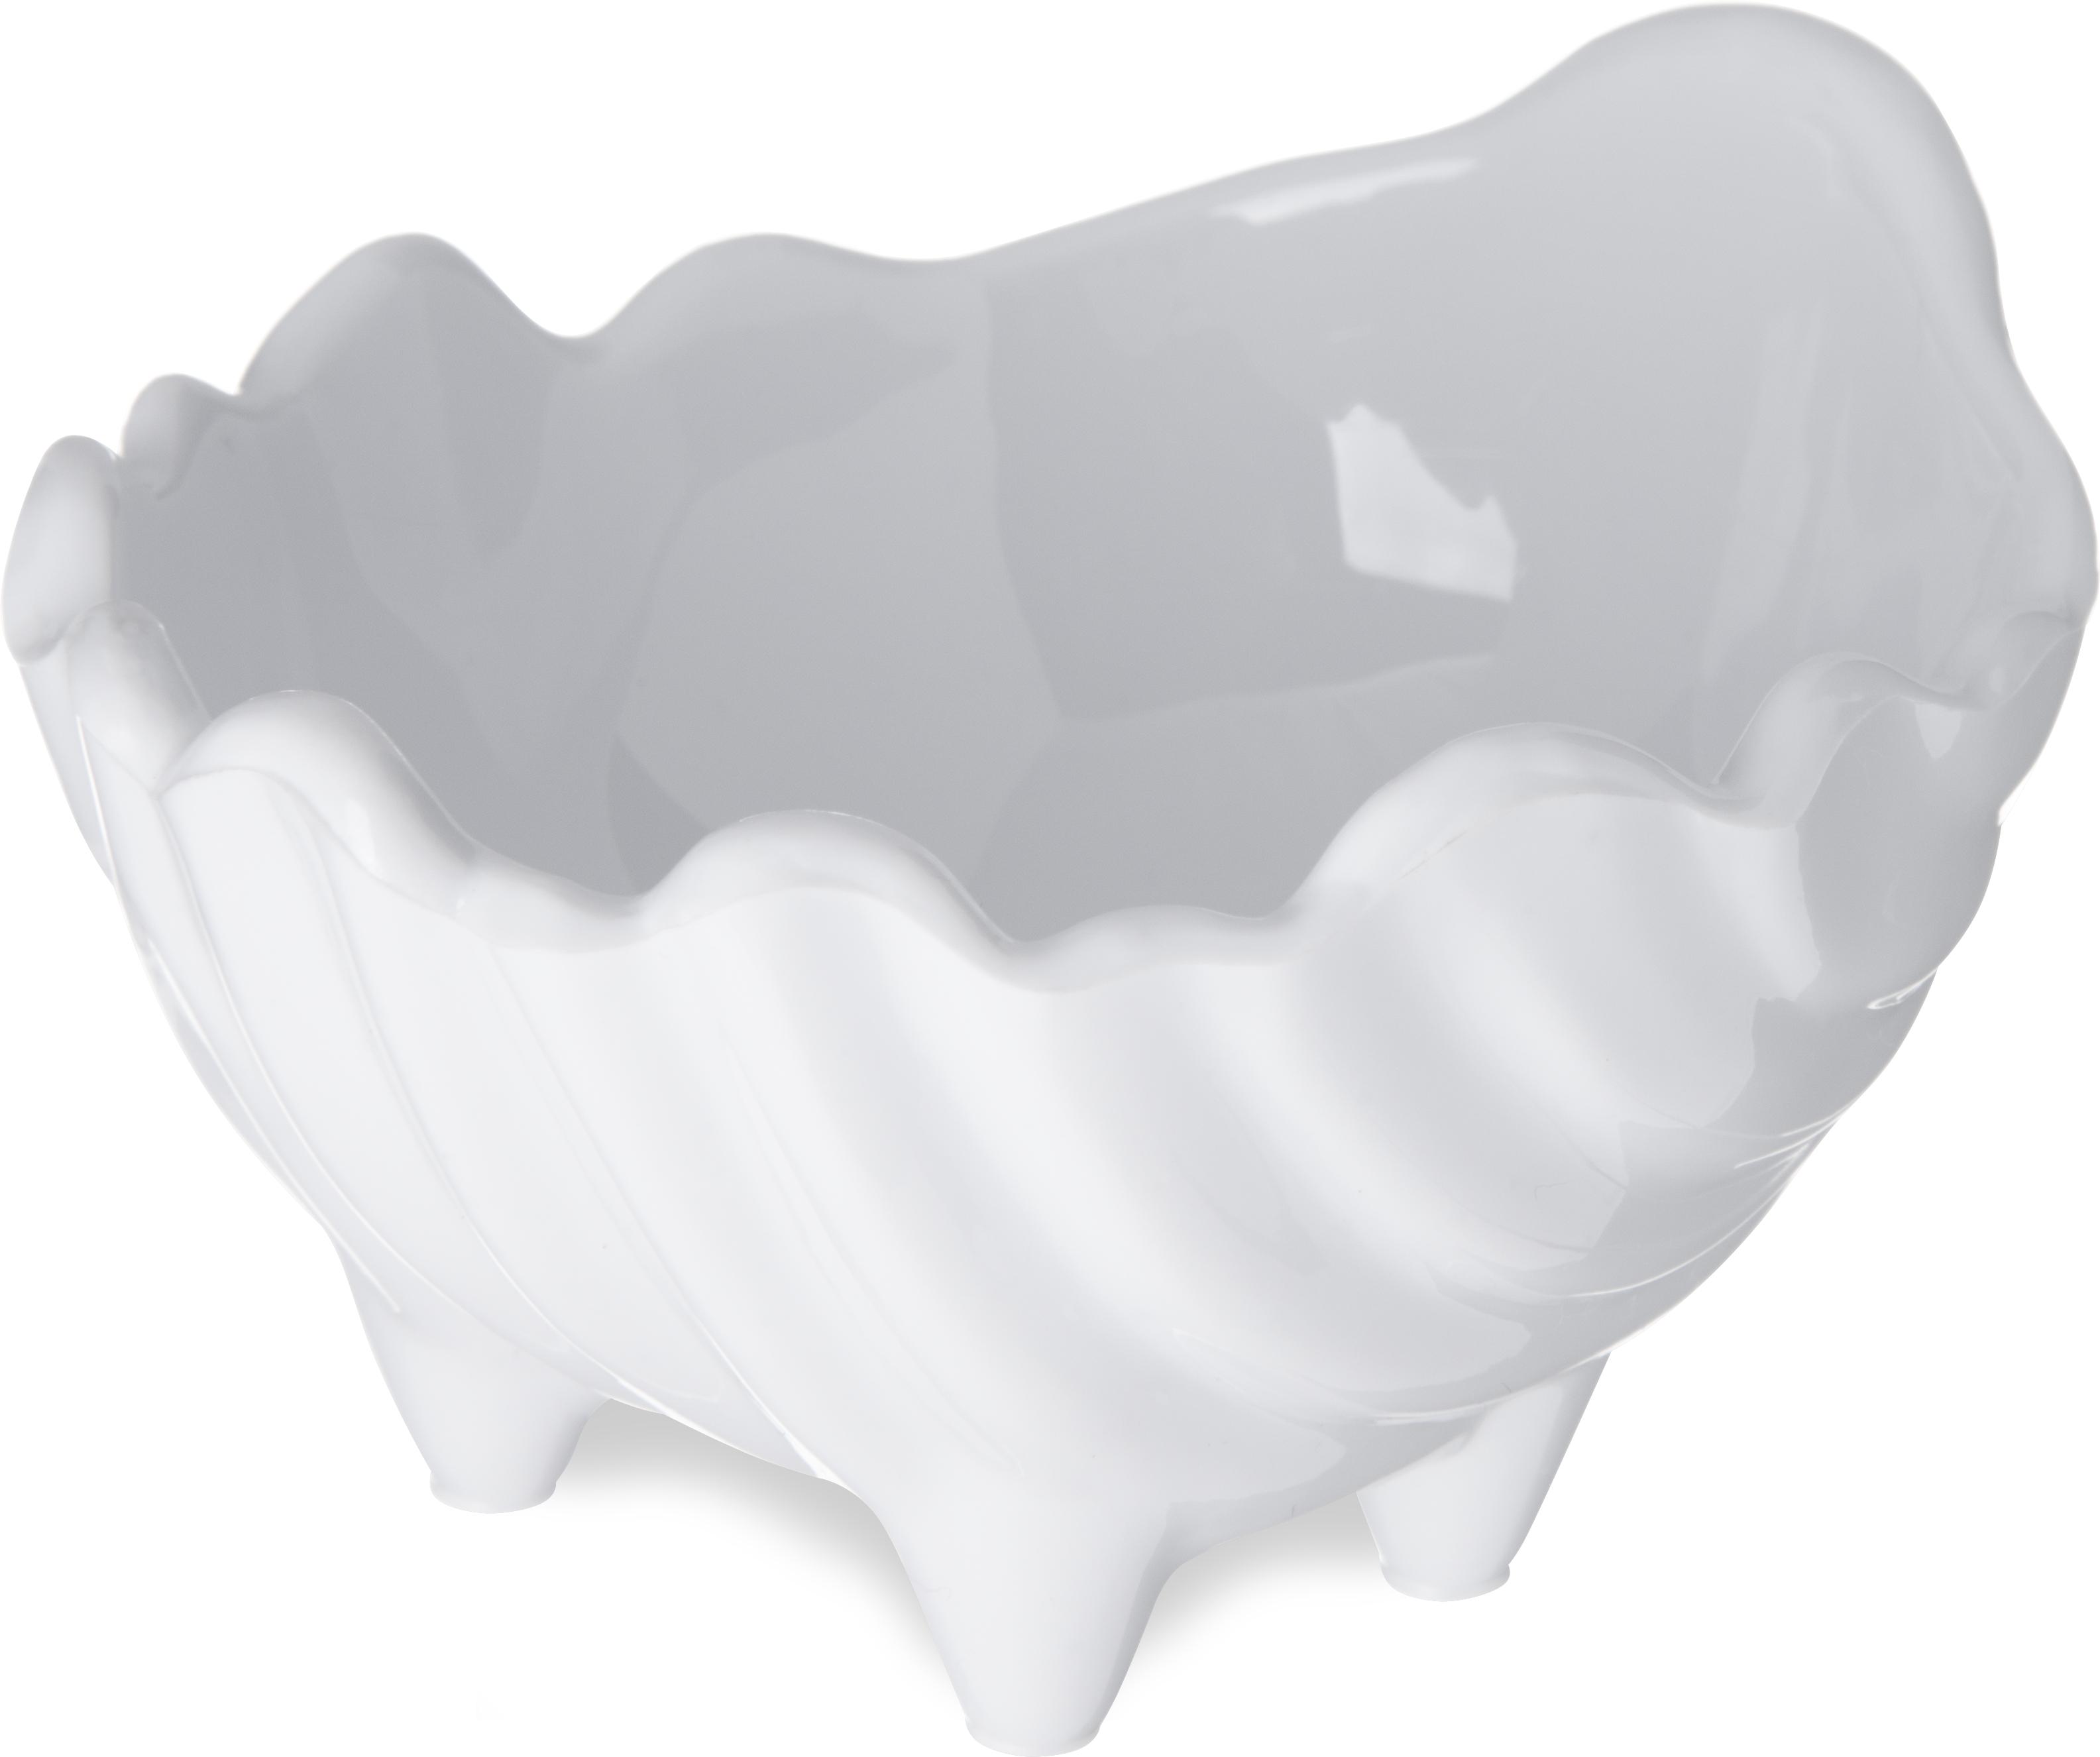 SAN Sea Shell Scalloped Sauce Cup Ramekin 2 oz - White